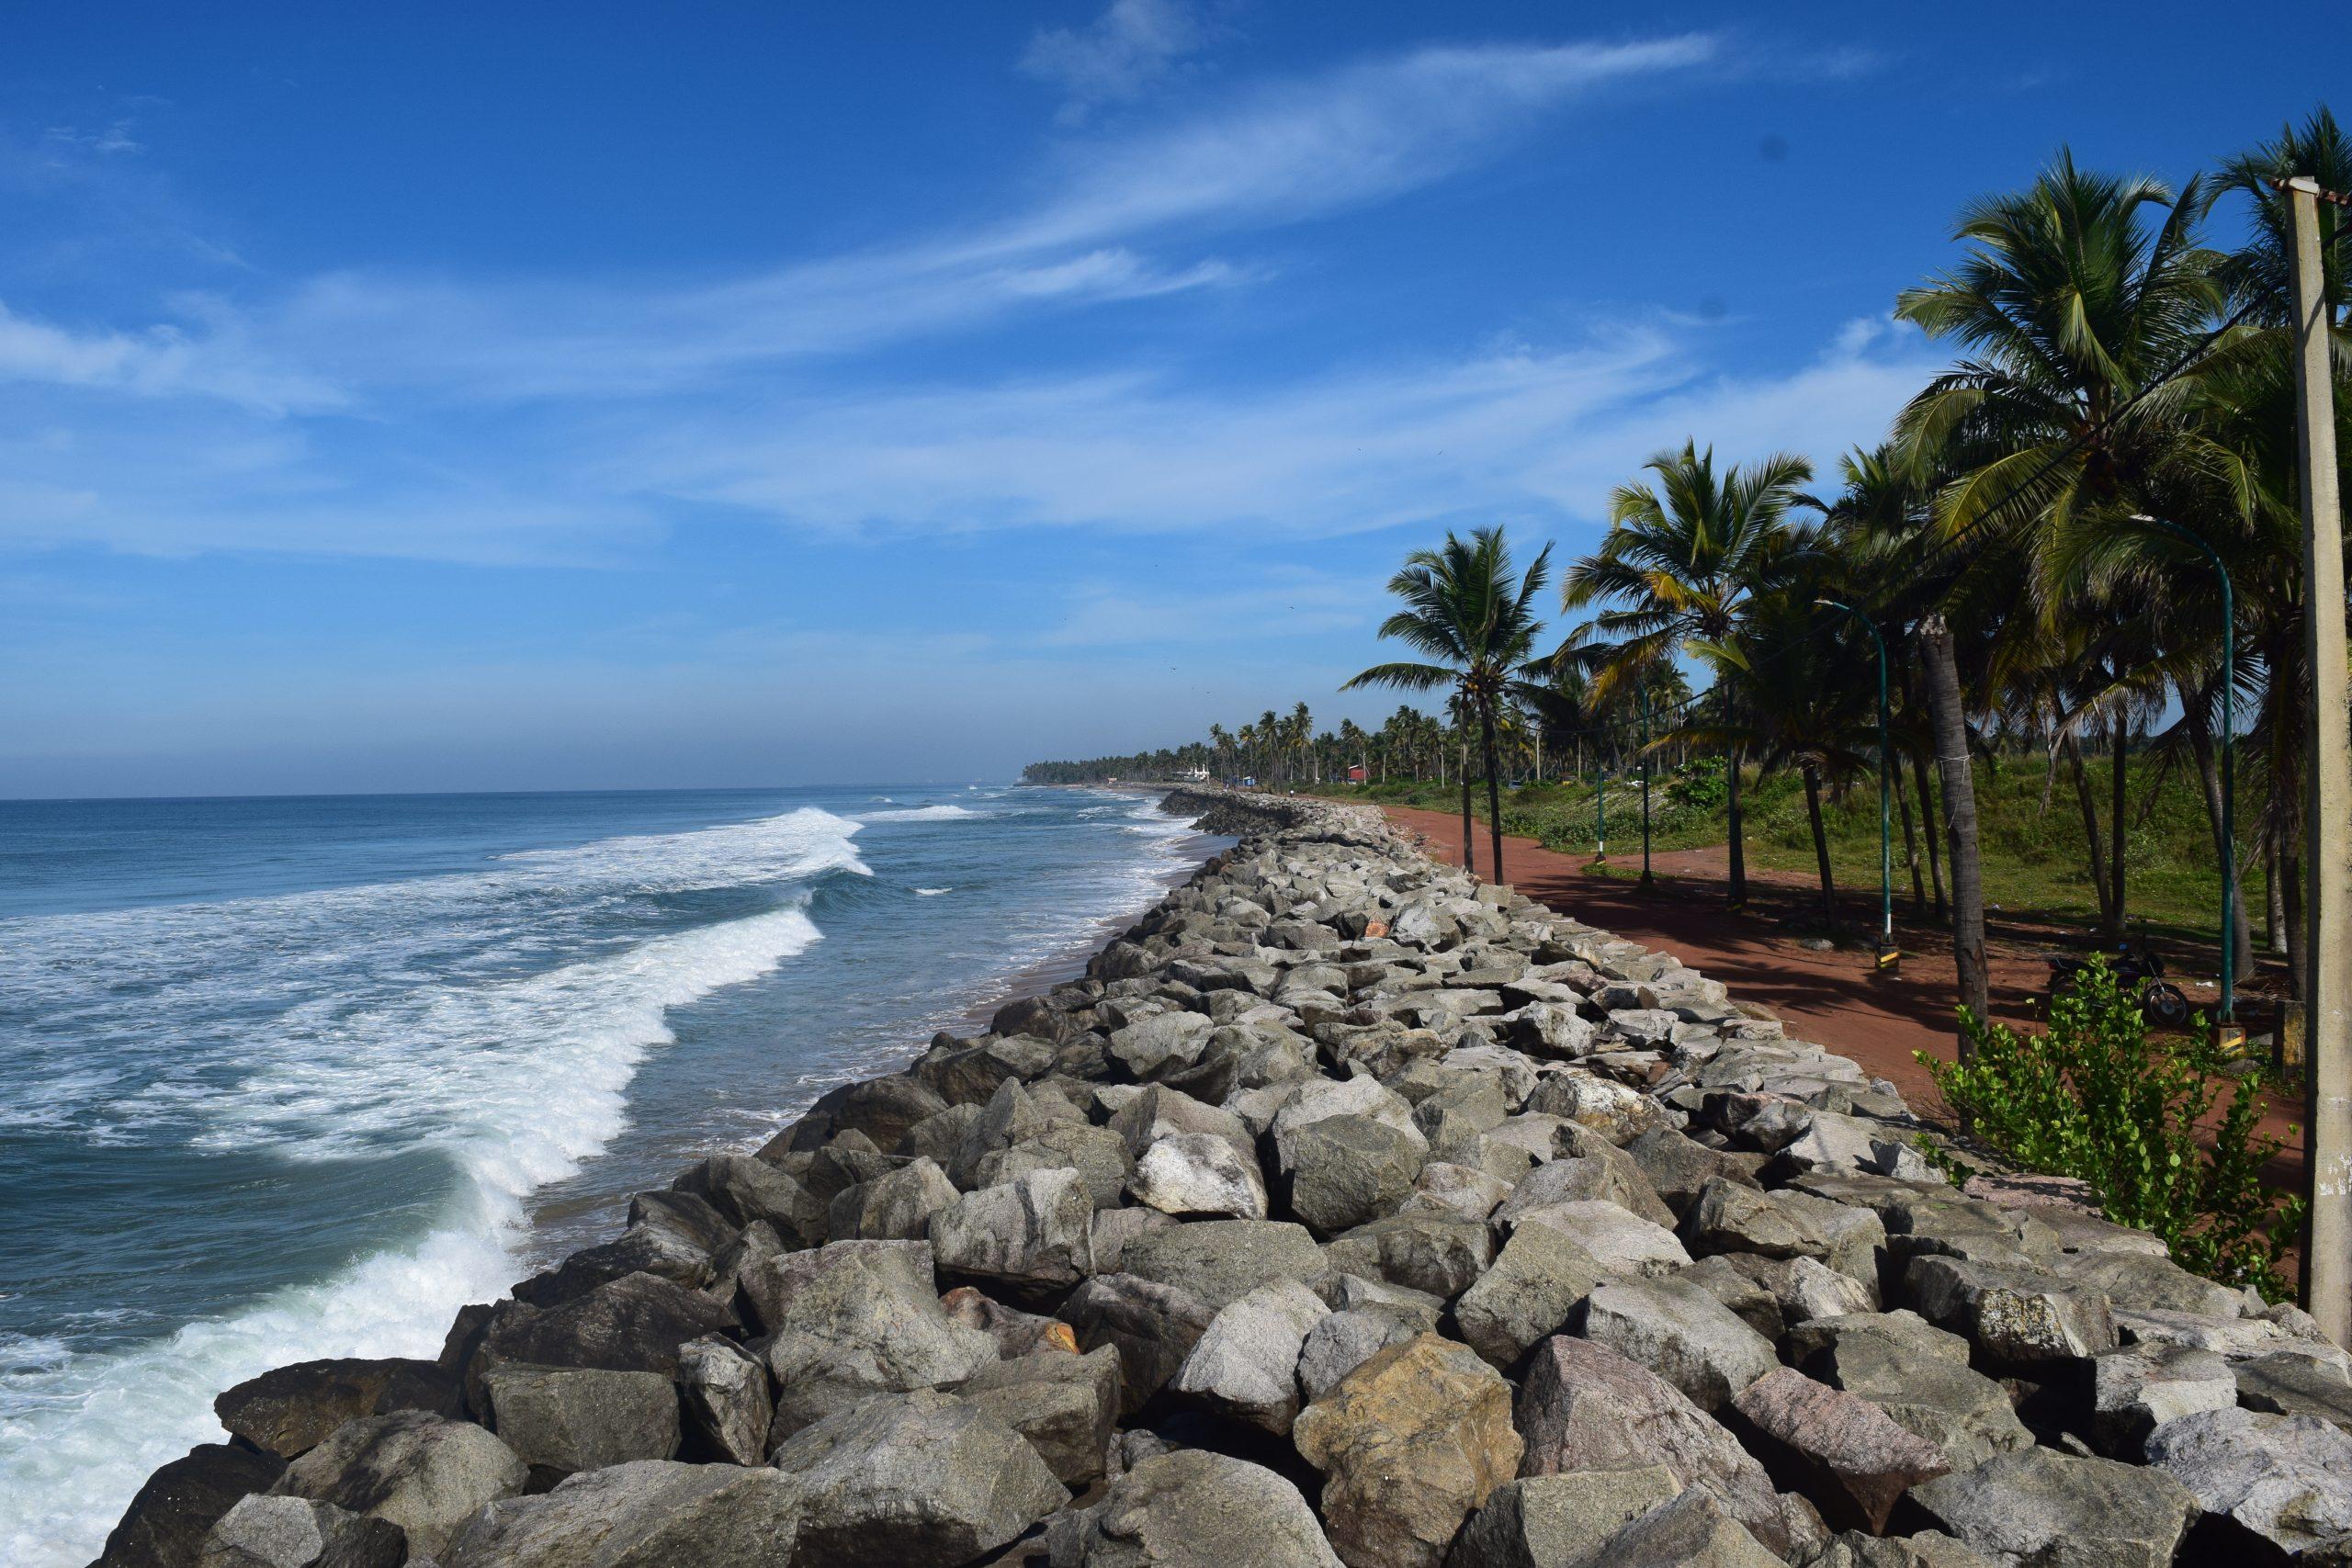 Kappil beach in Trivandrum